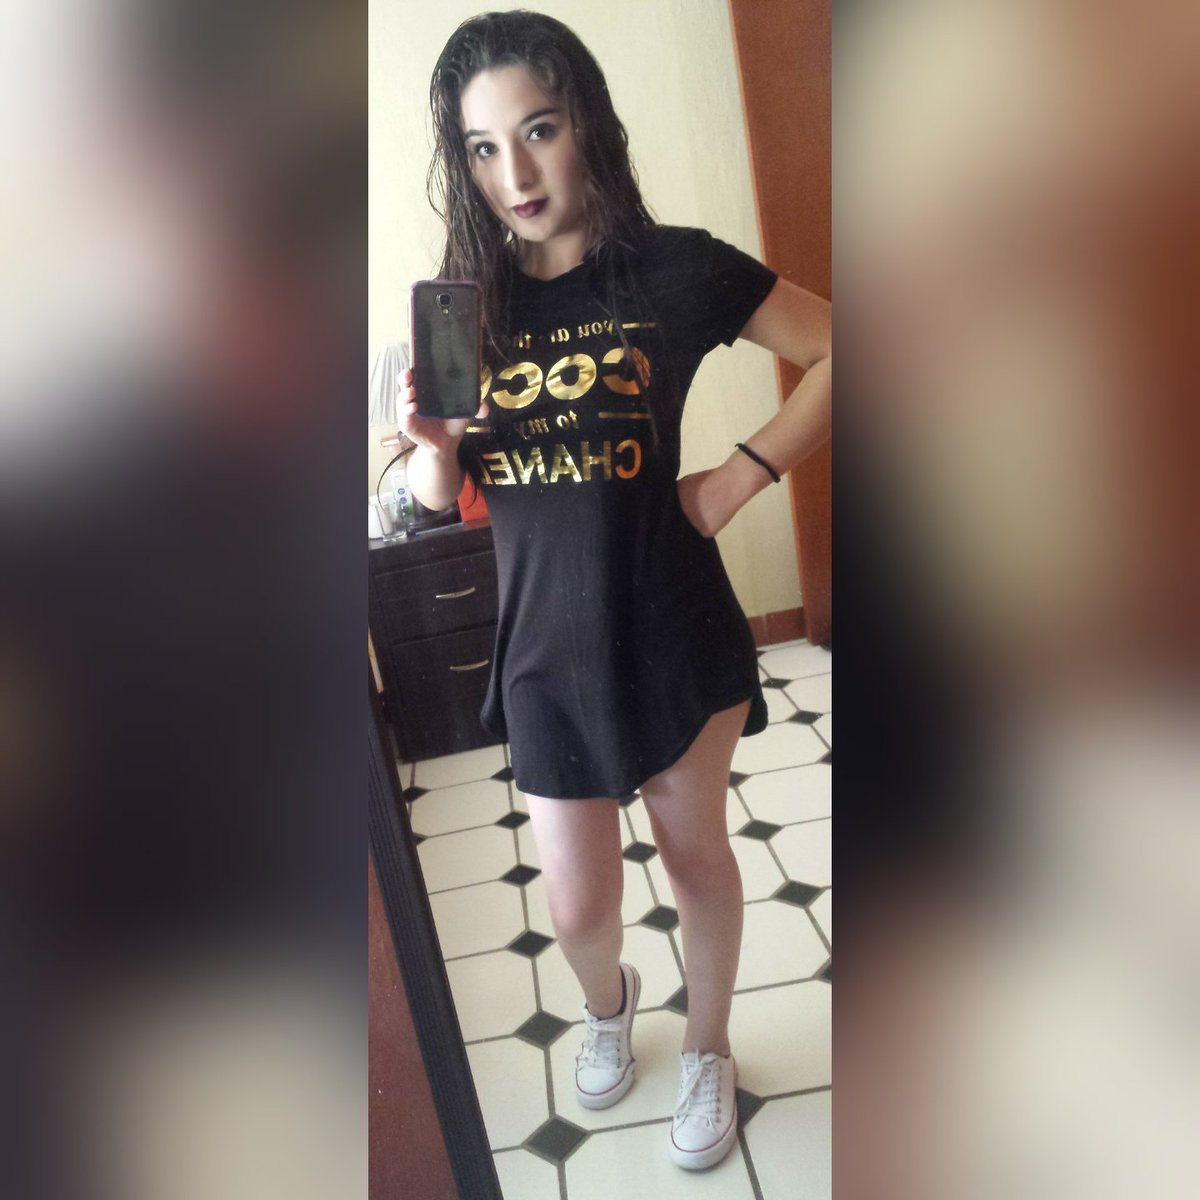 Paparazzi Carolina Sanchez naked (73 foto and video), Ass, Is a cute, Selfie, lingerie 2018